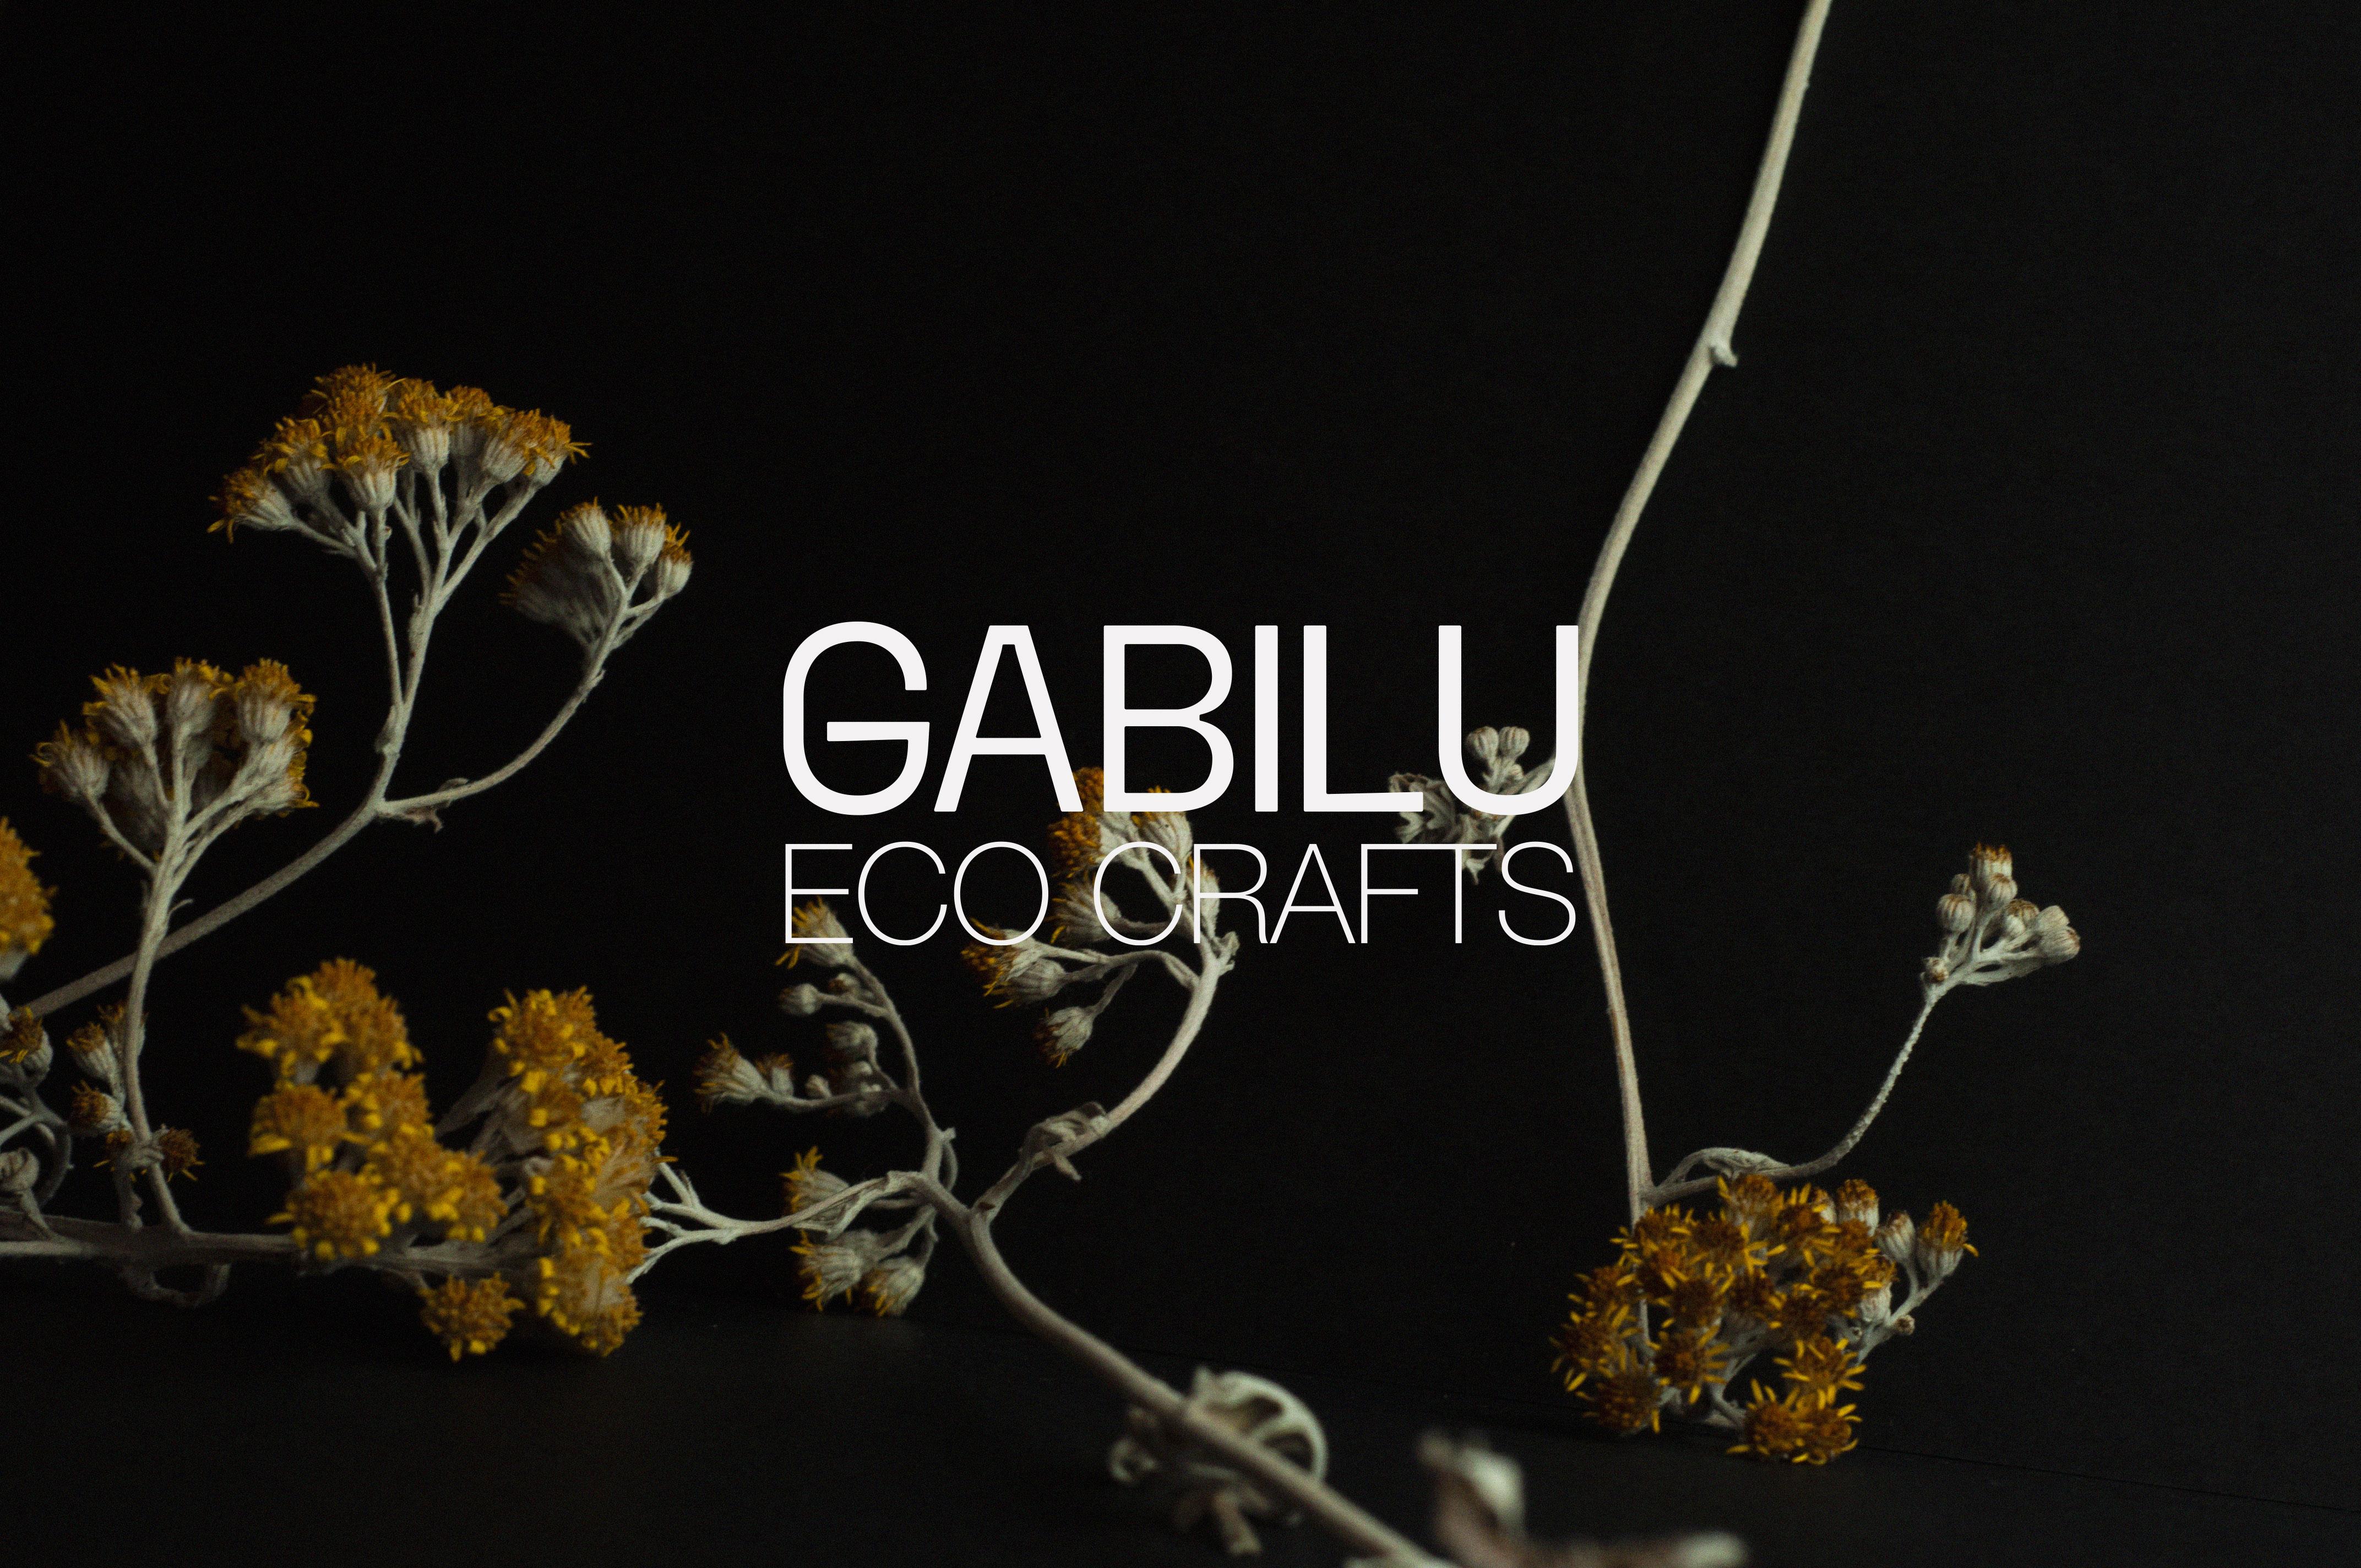 Cover image: Gabilu Eco Crafts - Brand Identity